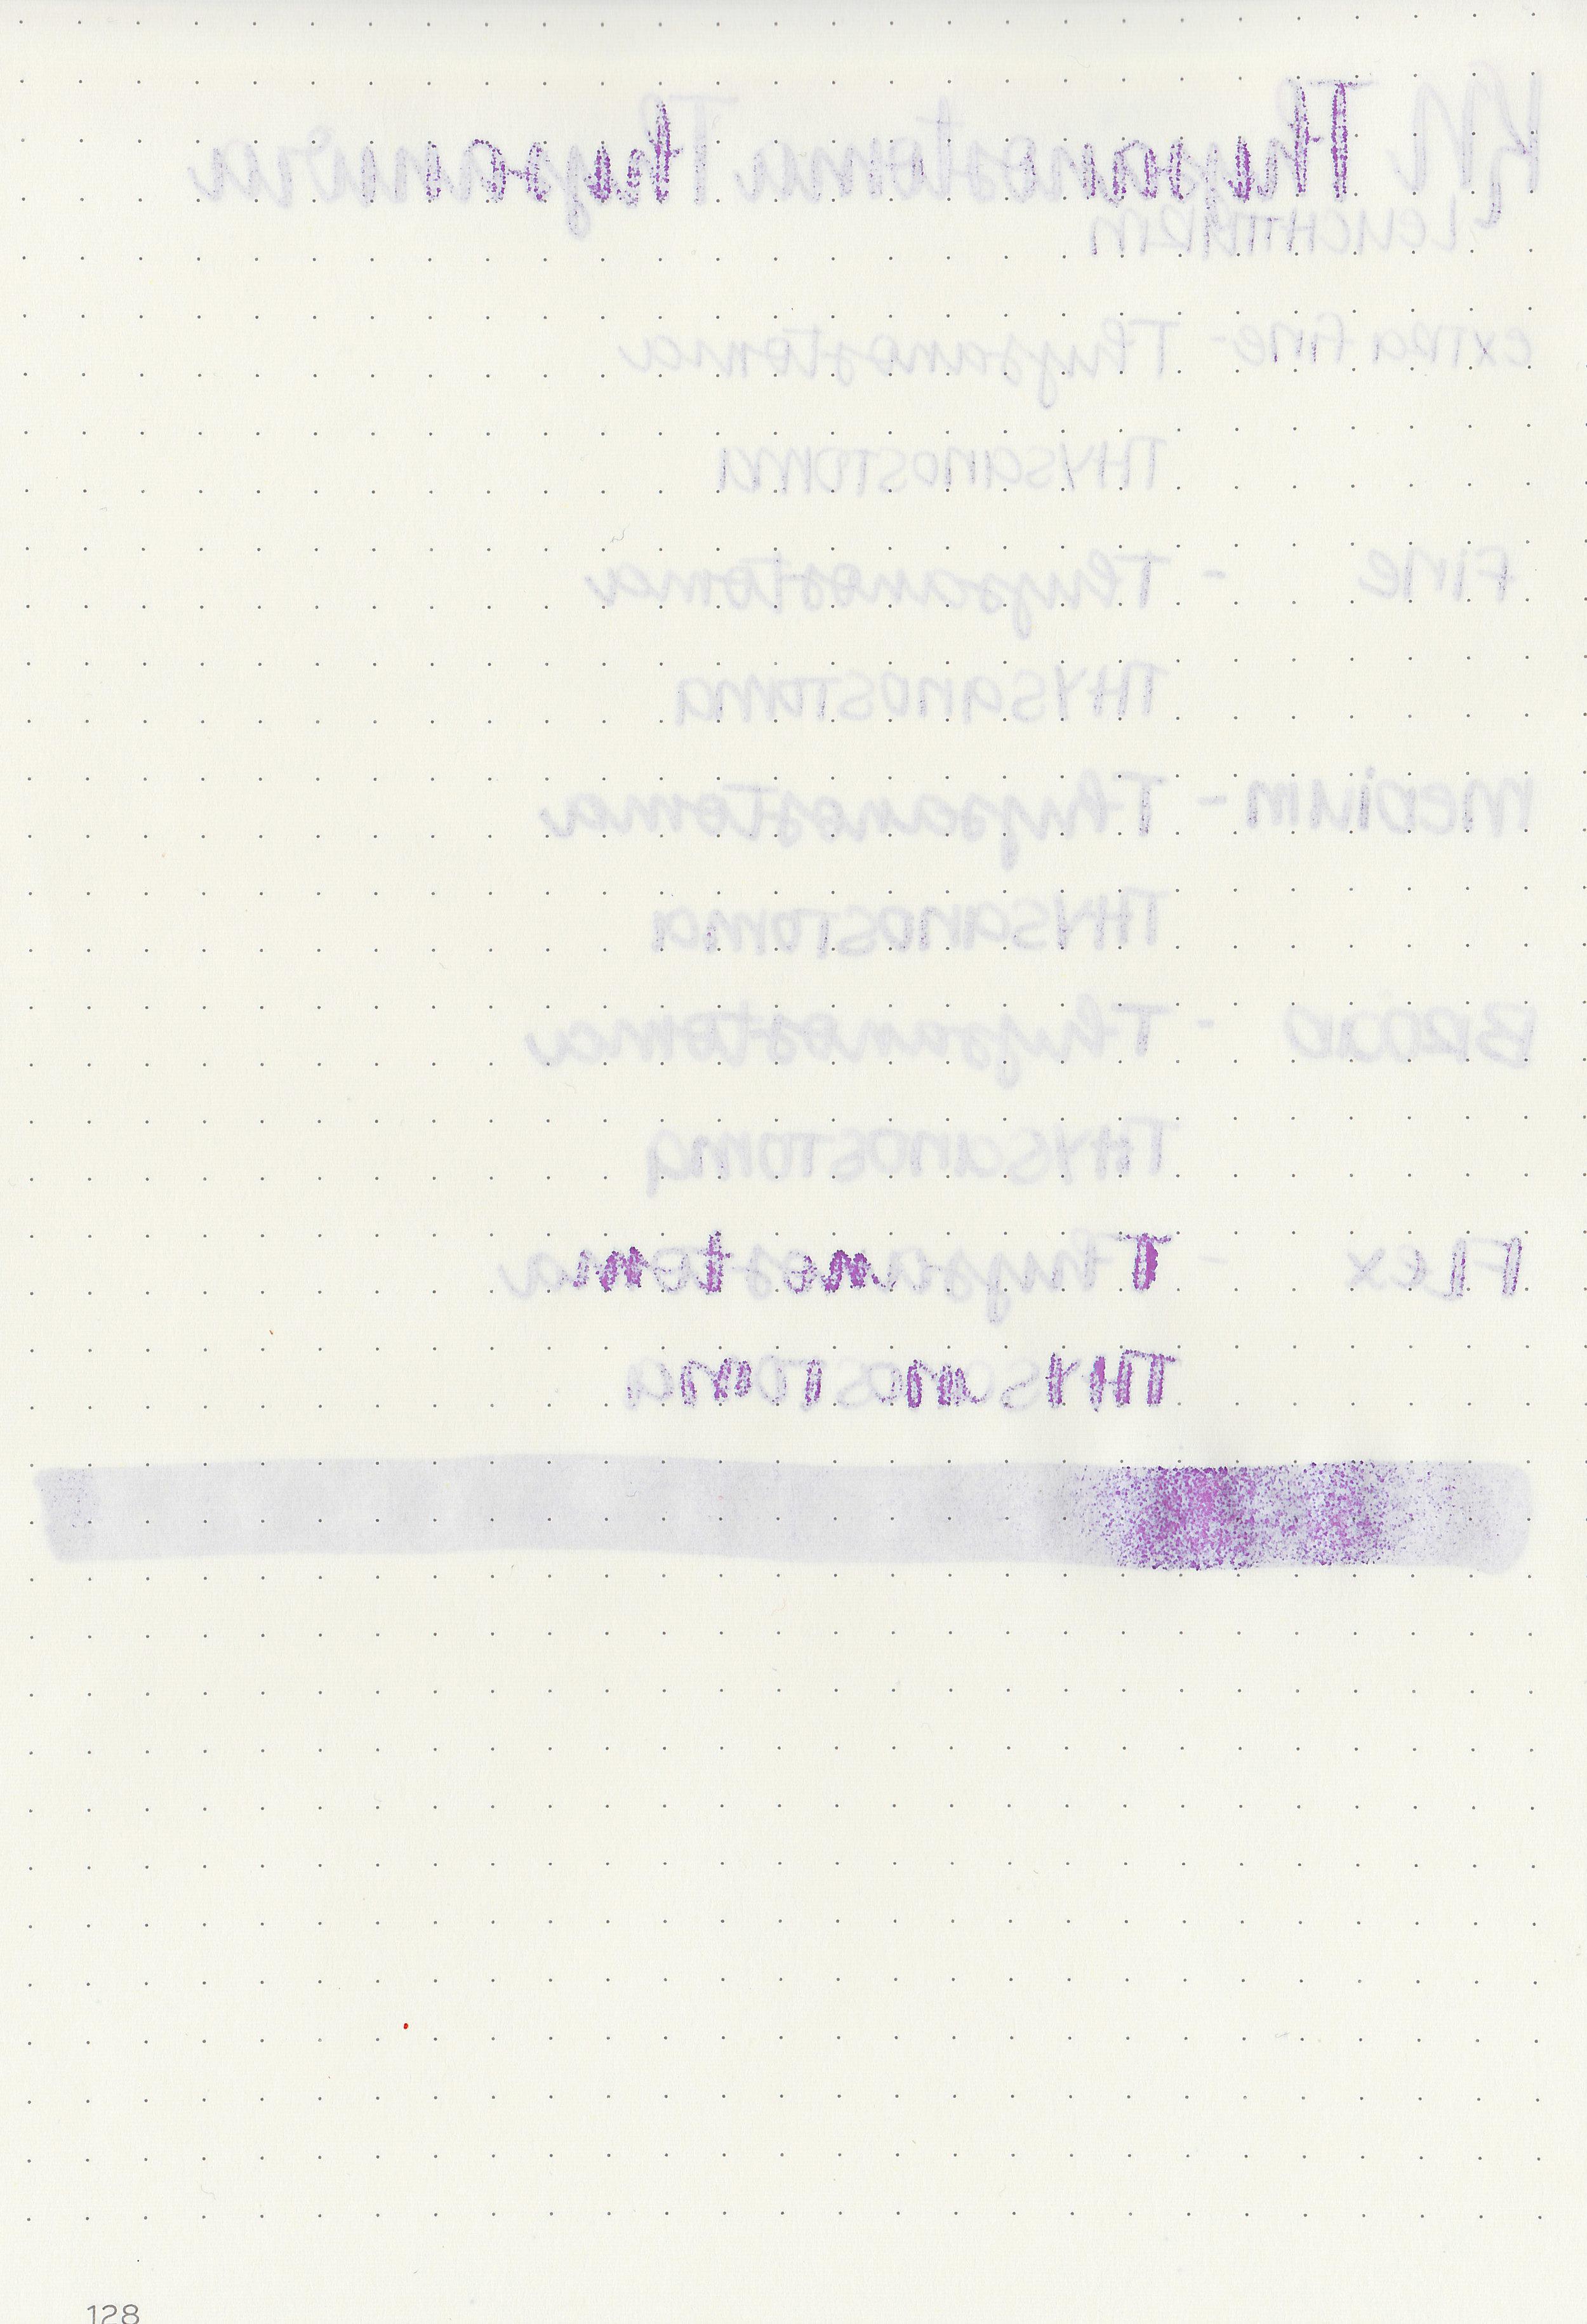 kn-thysanostoma-thysanura-8.jpg